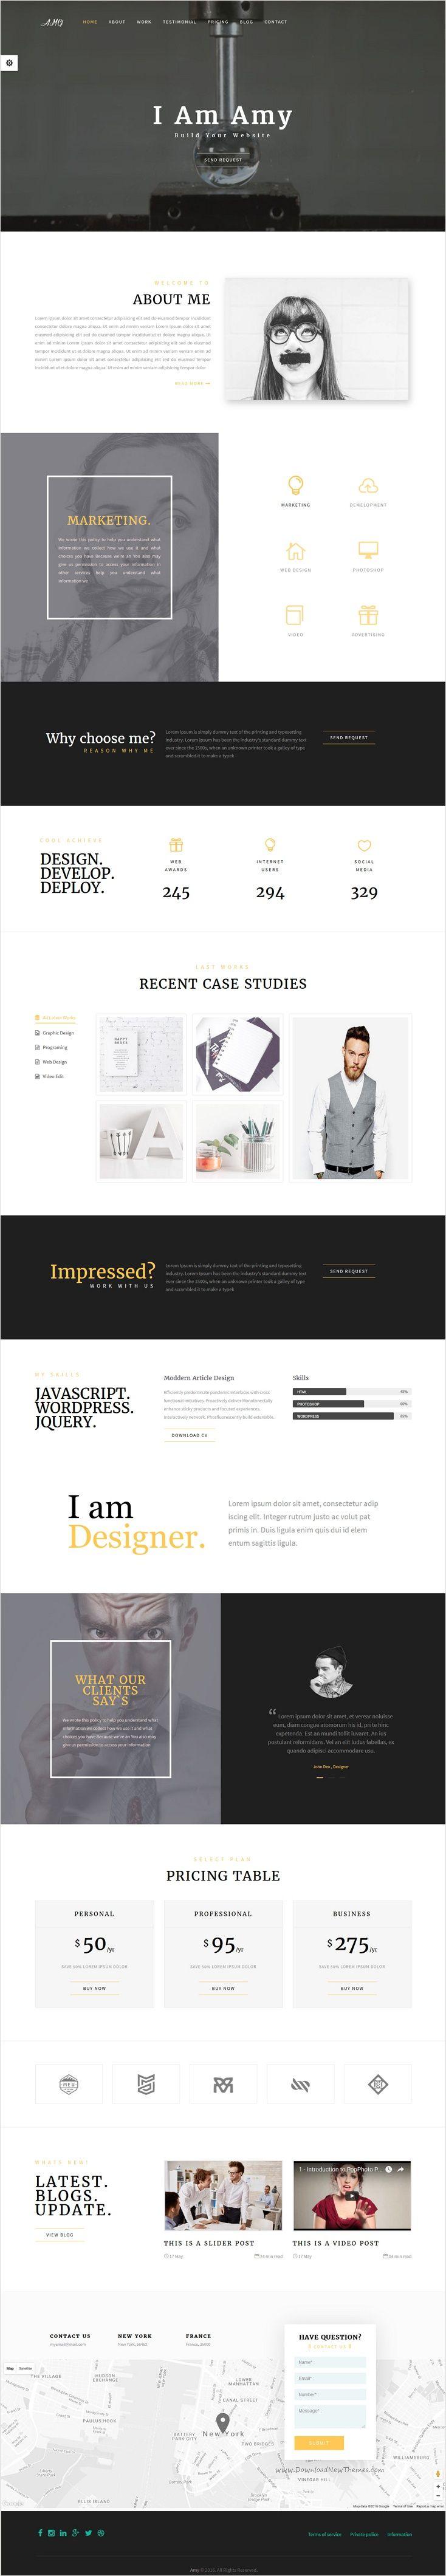 amy responsive corporate business portfolio template. Black Bedroom Furniture Sets. Home Design Ideas